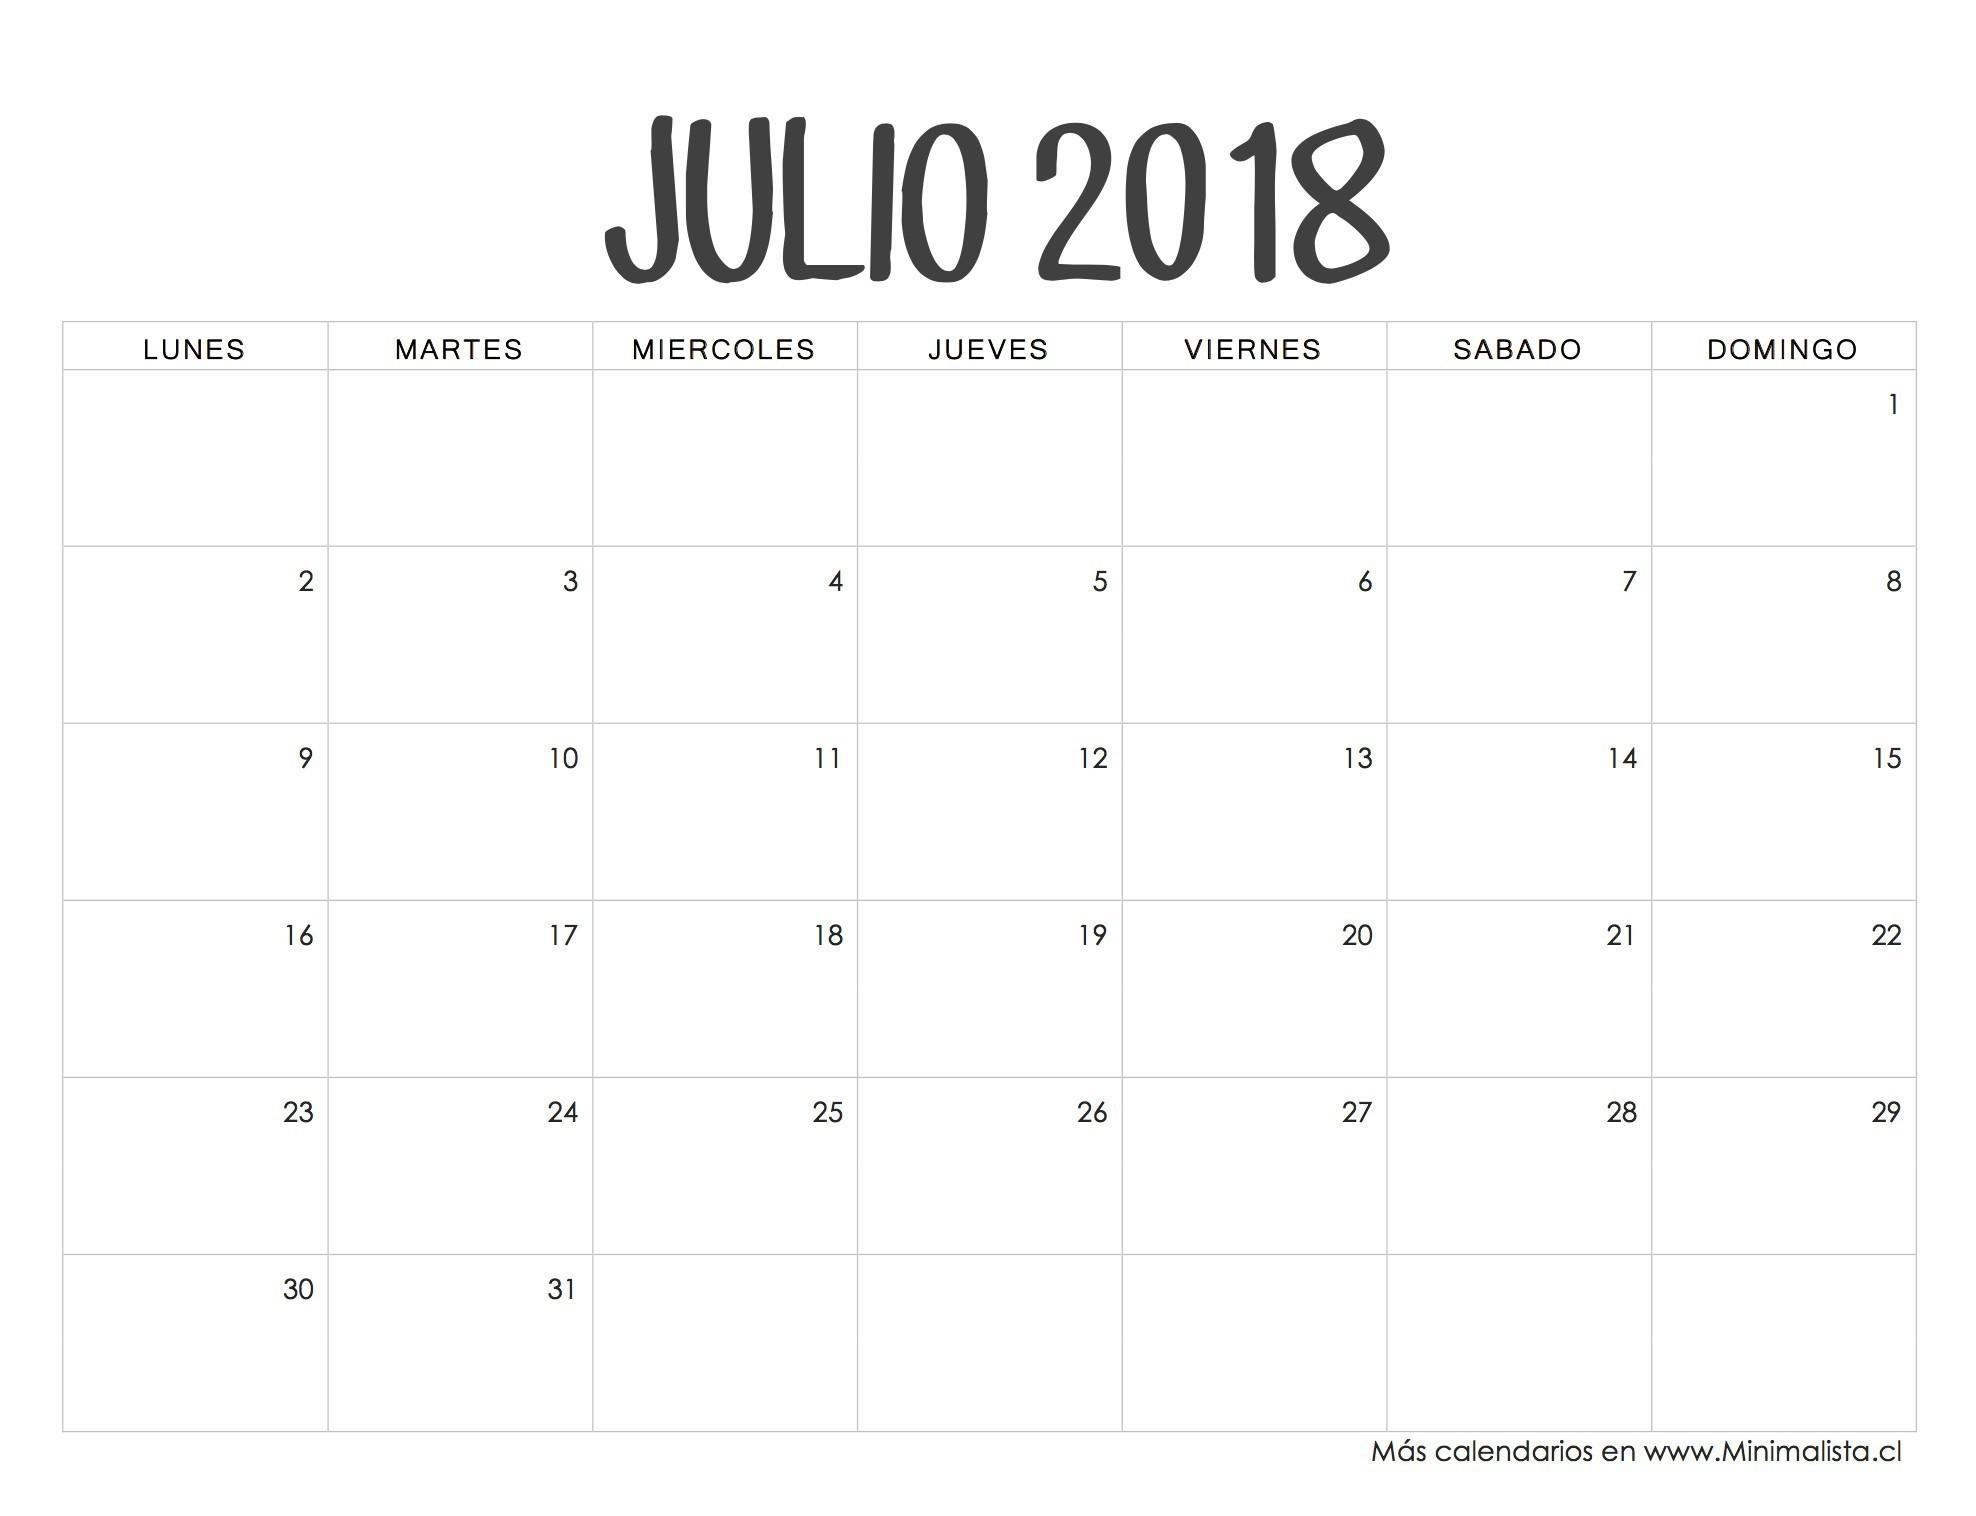 march 31 2019 tamil calendar best of calendar for march 2019 march 2019 calendar template 2 550 3 300 of march 31 2019 tamil calendar